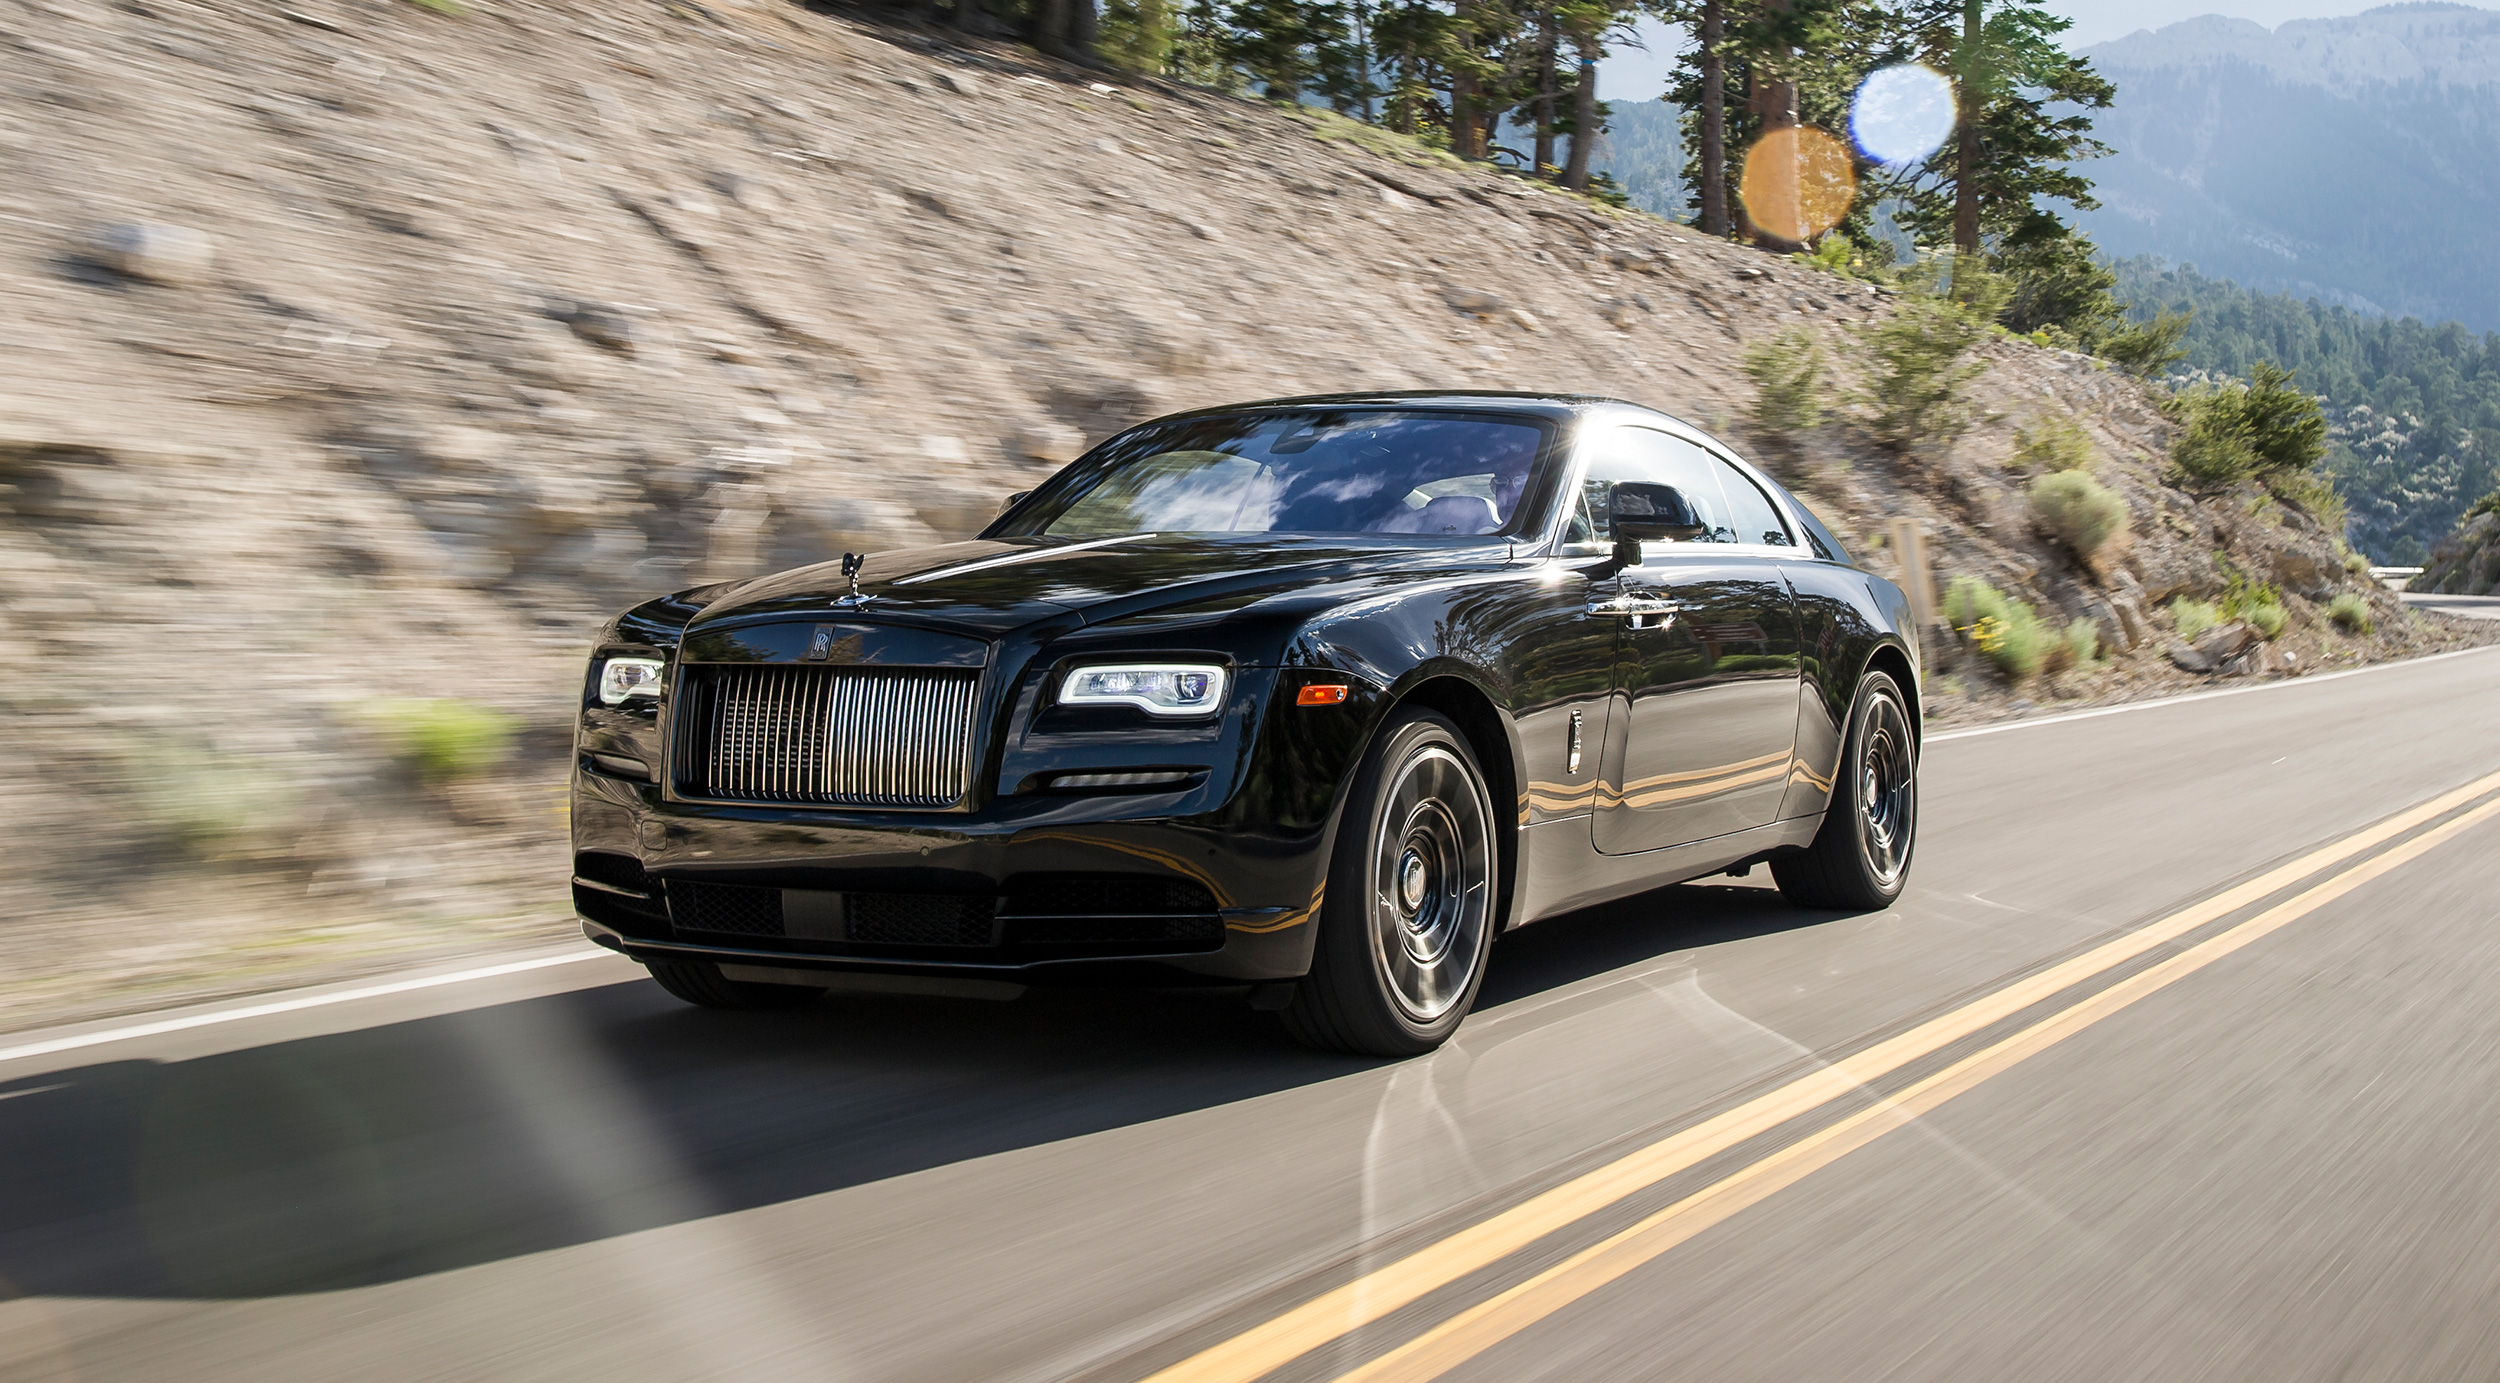 Rolls-Royce Wraith Black Badge 2017 - Autovisie.nl